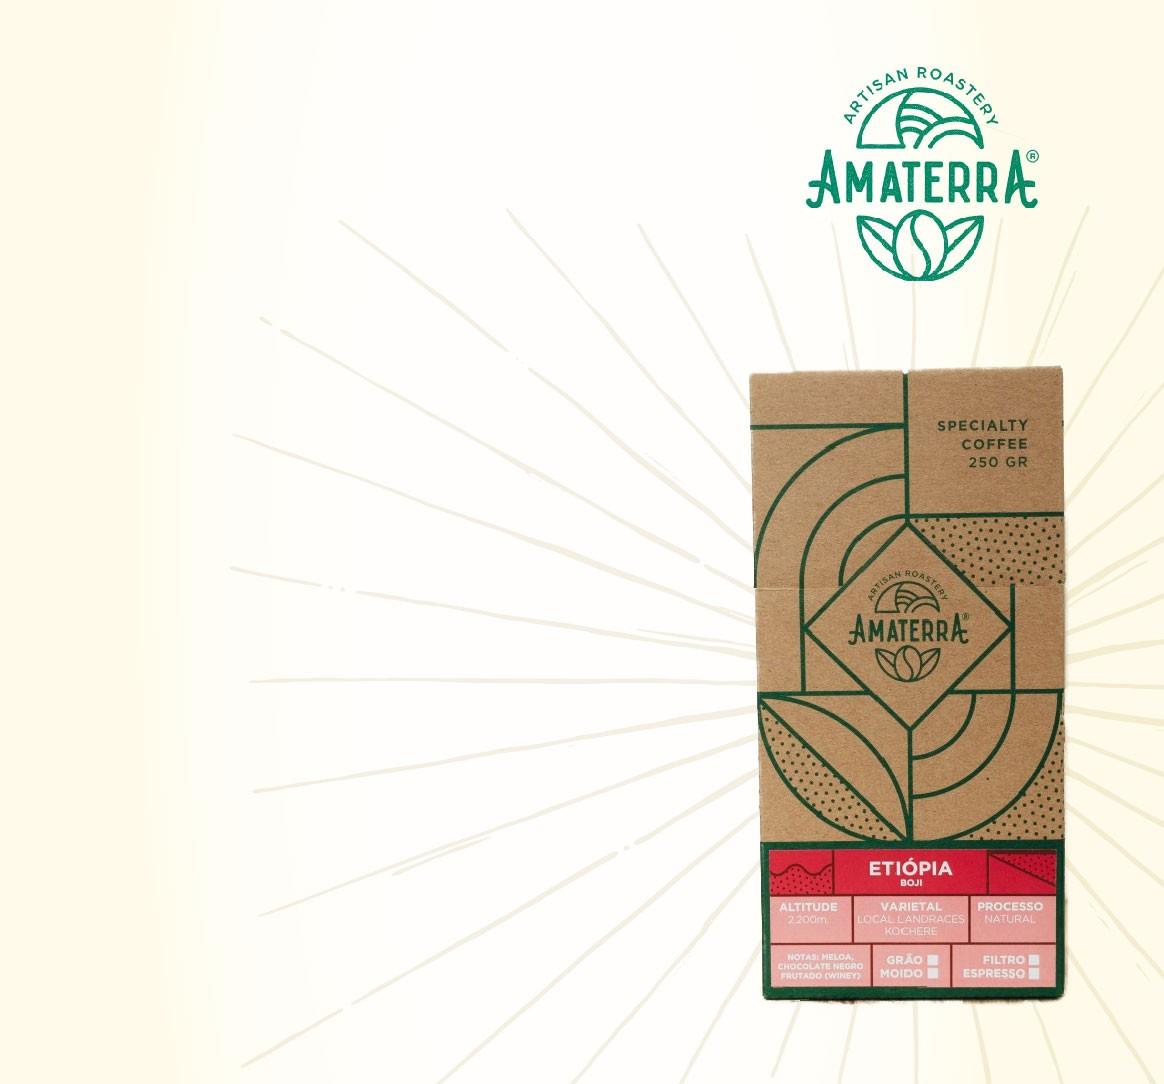 Café Amaterra